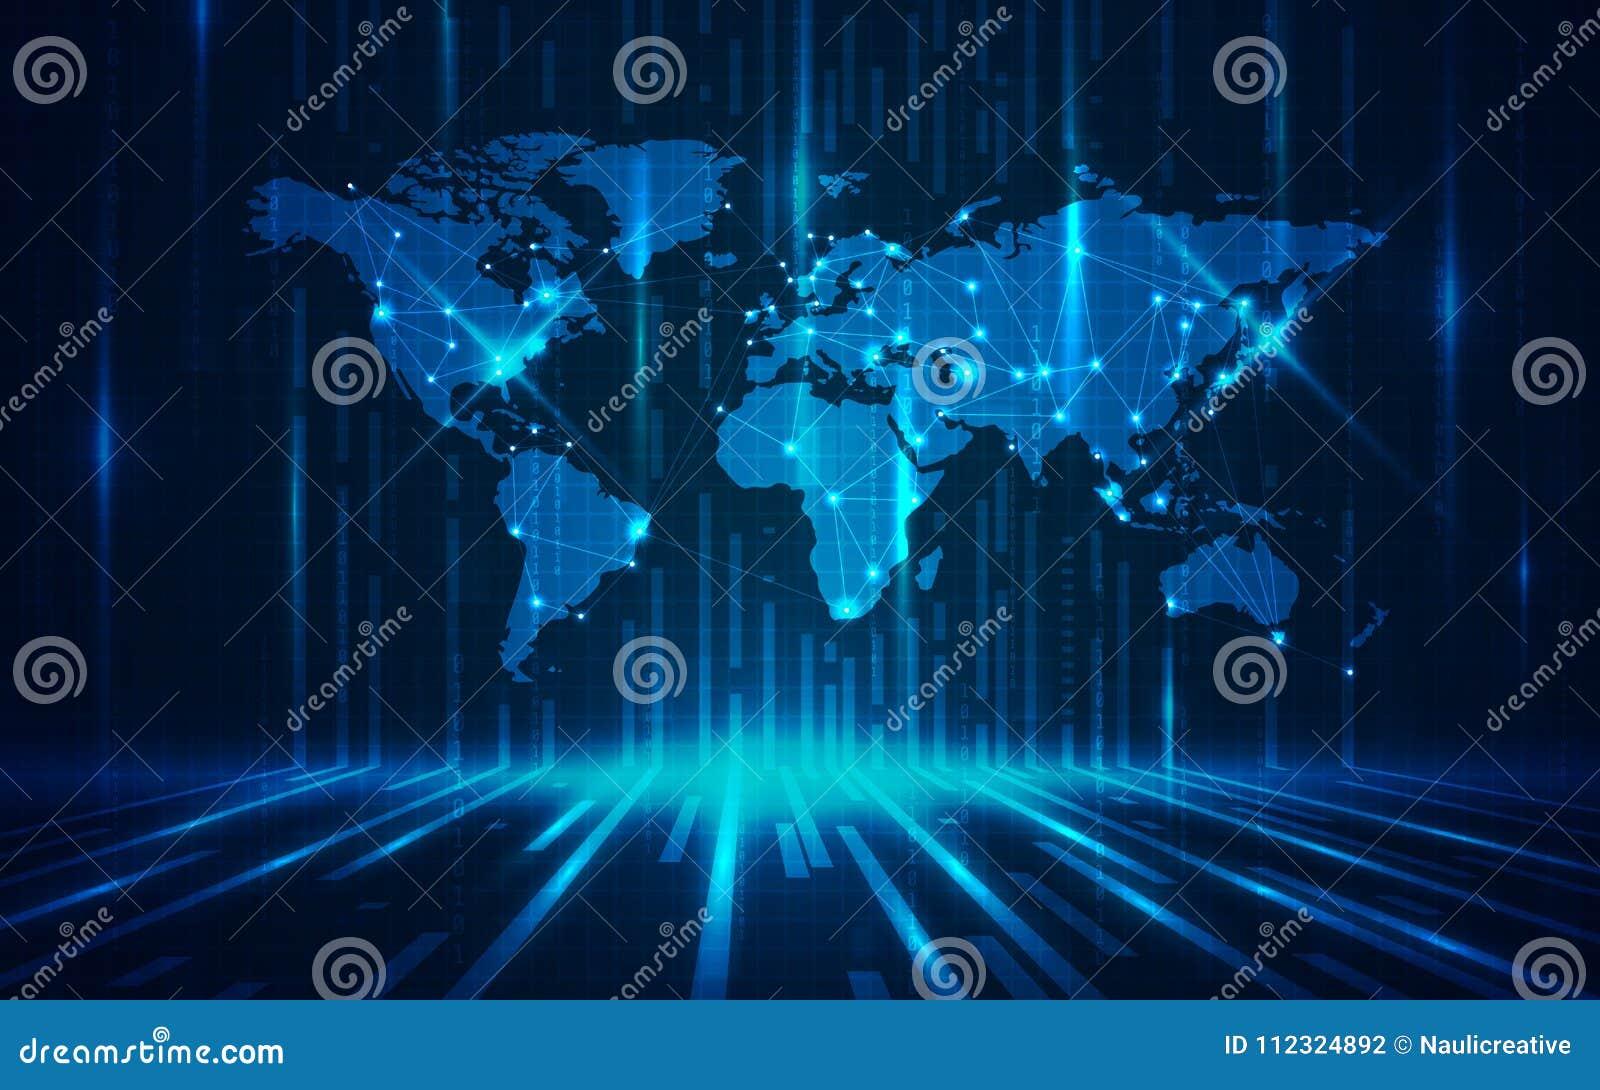 Ultra Hd Abstract Technology World Map Wallpaper Stock